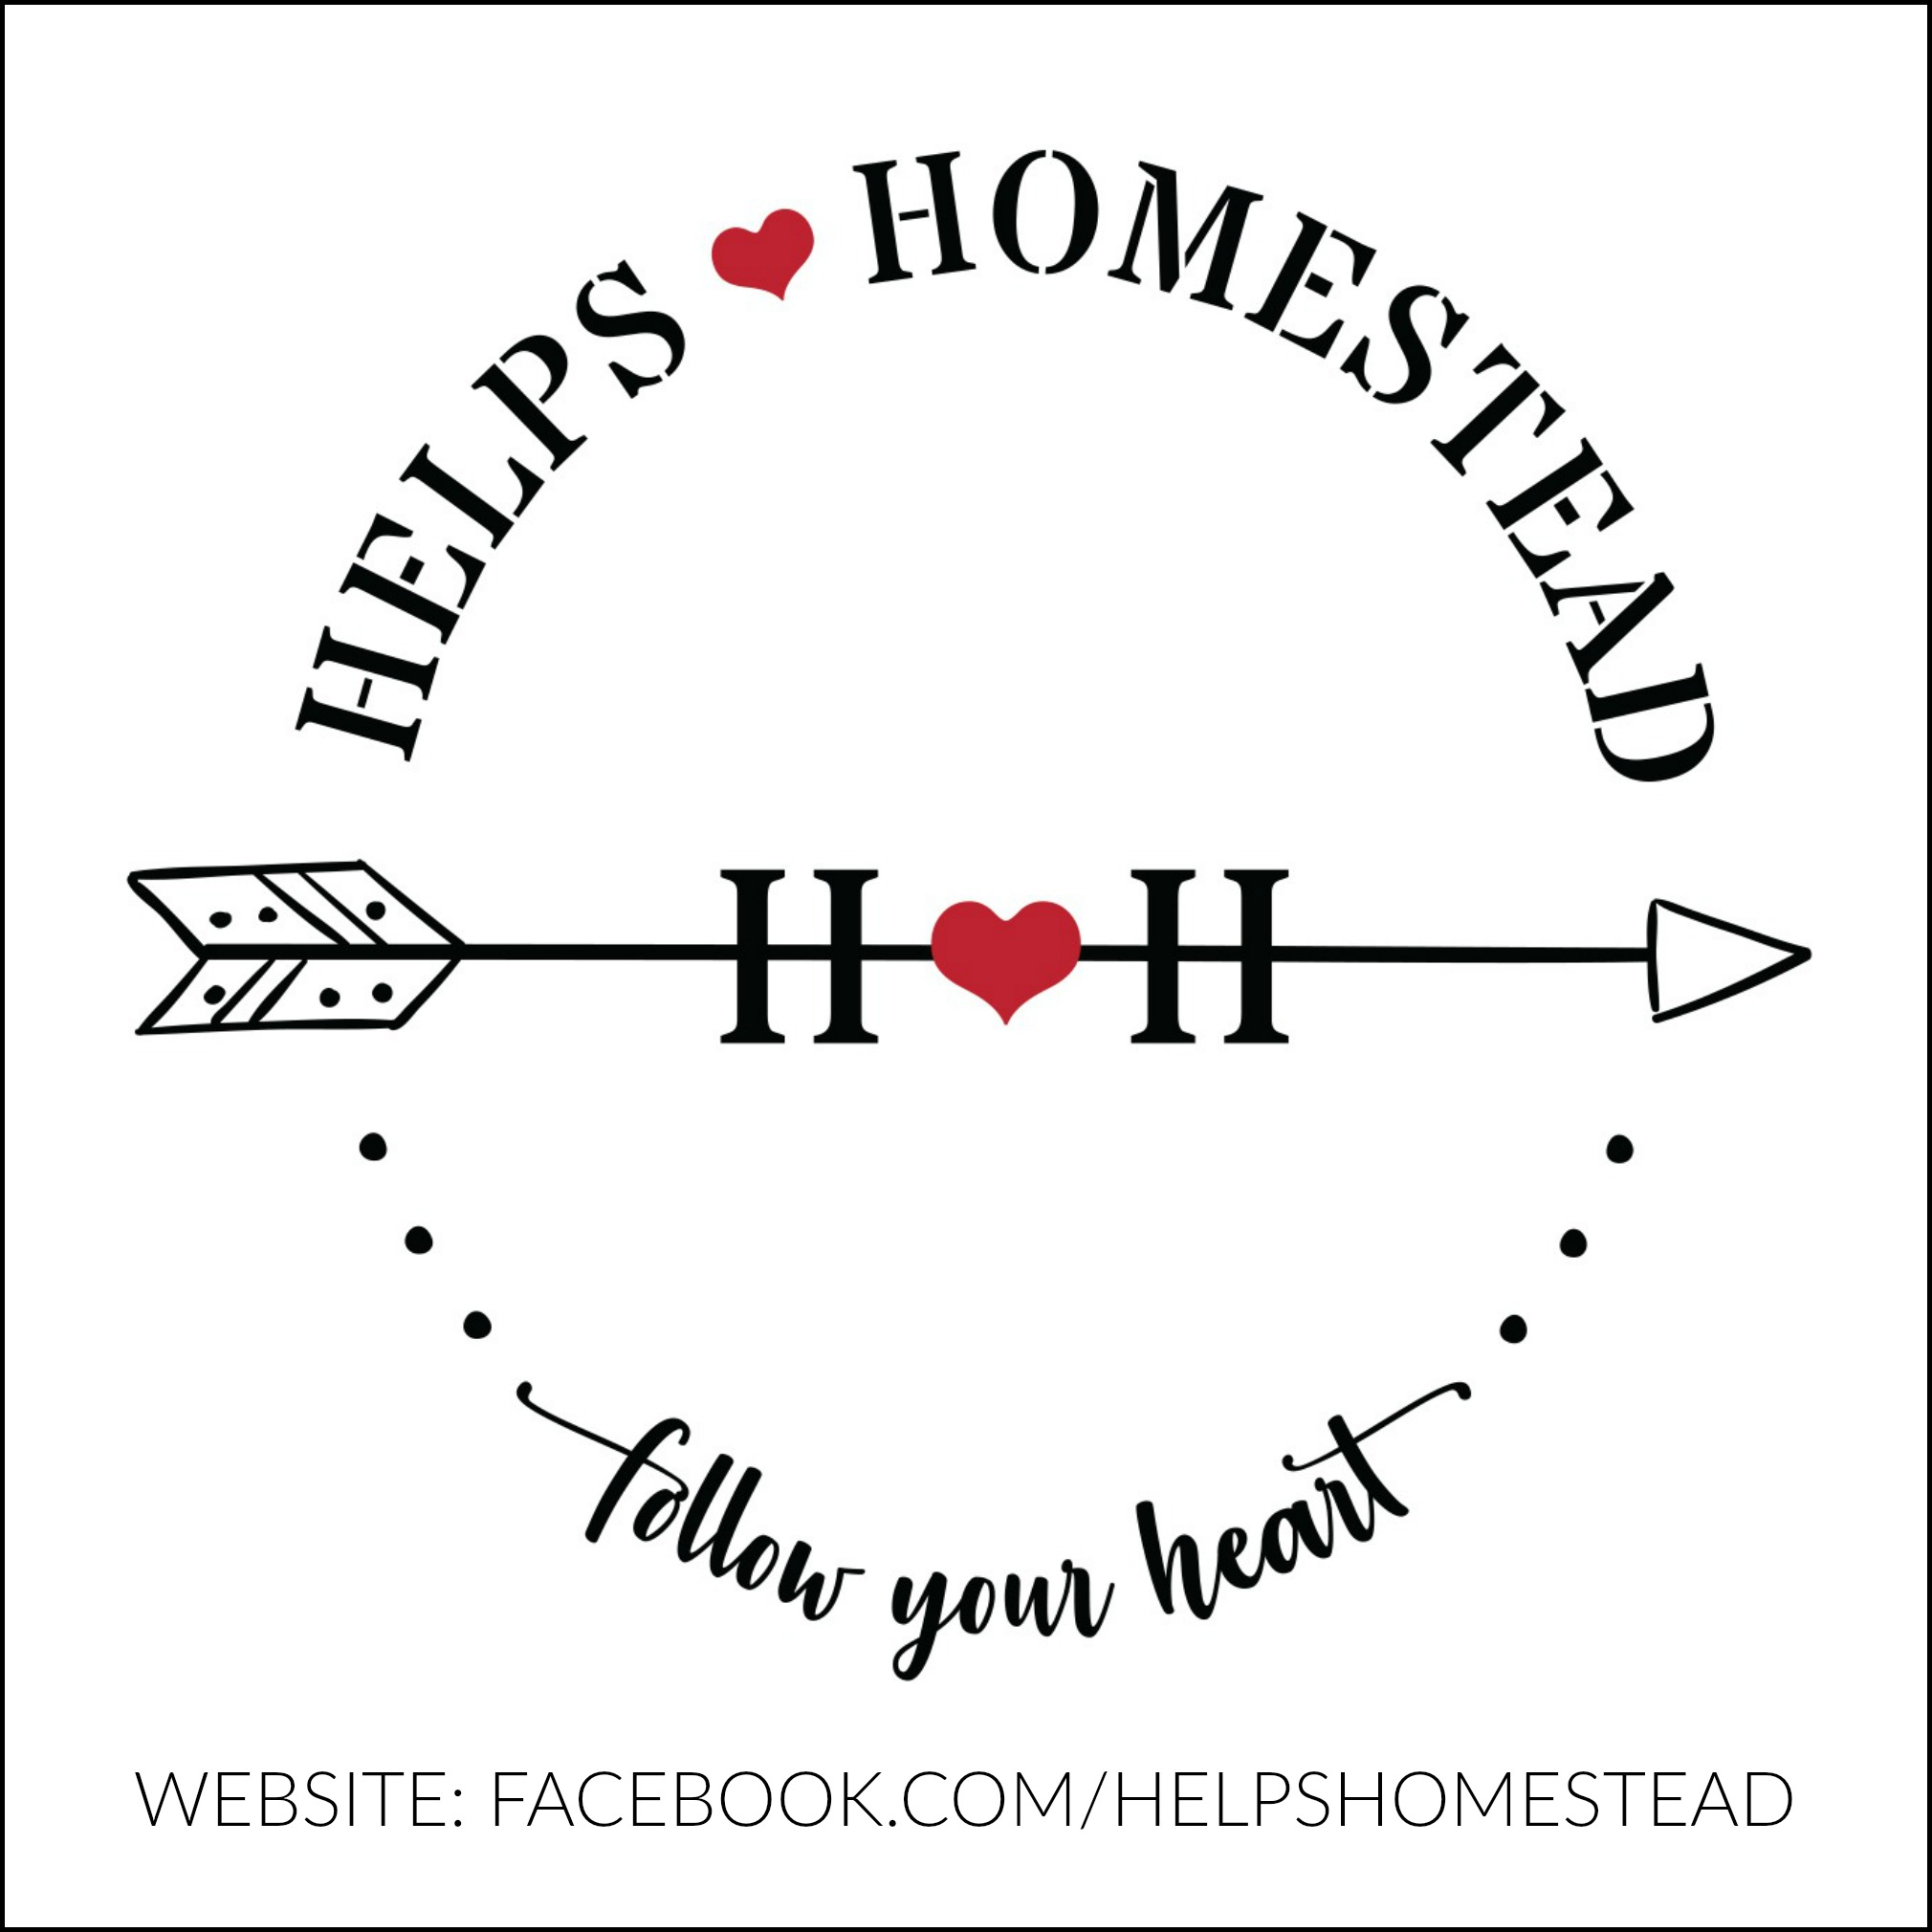 Helps Homestead | FACEBOOK.COM/HELPSHOMESTEAD